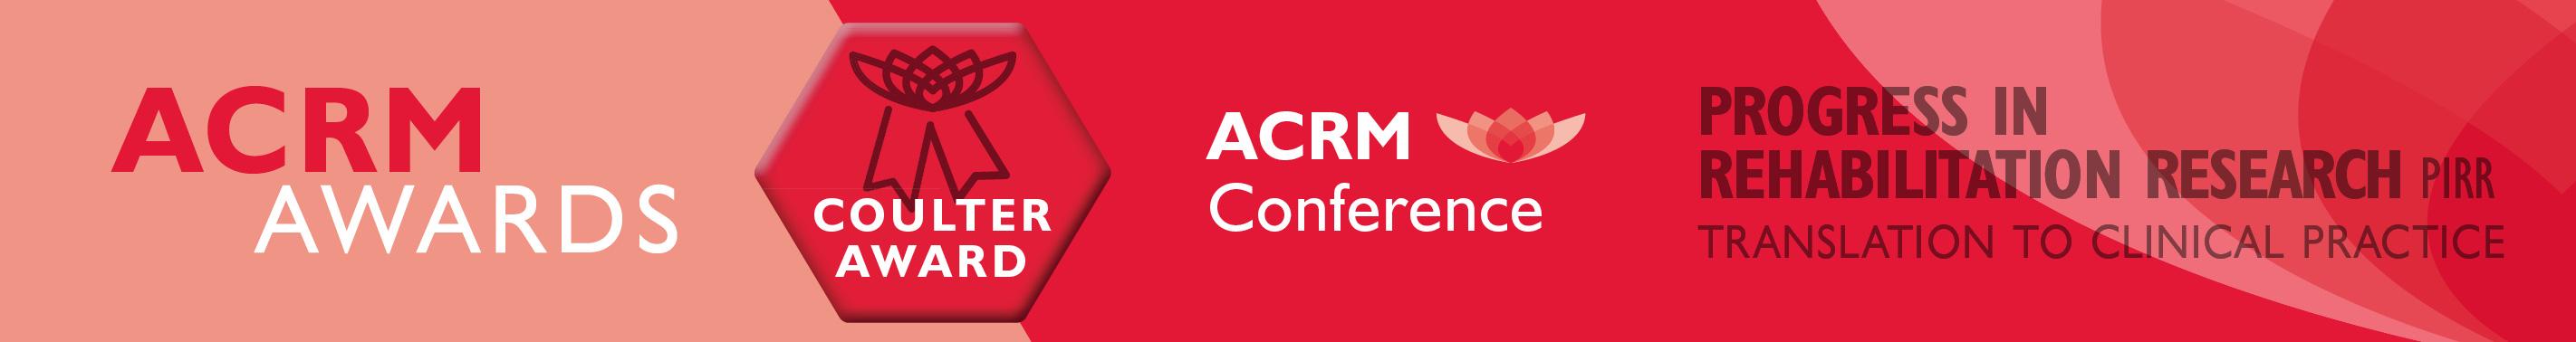 John Stanley Coulter Award ACRM Award